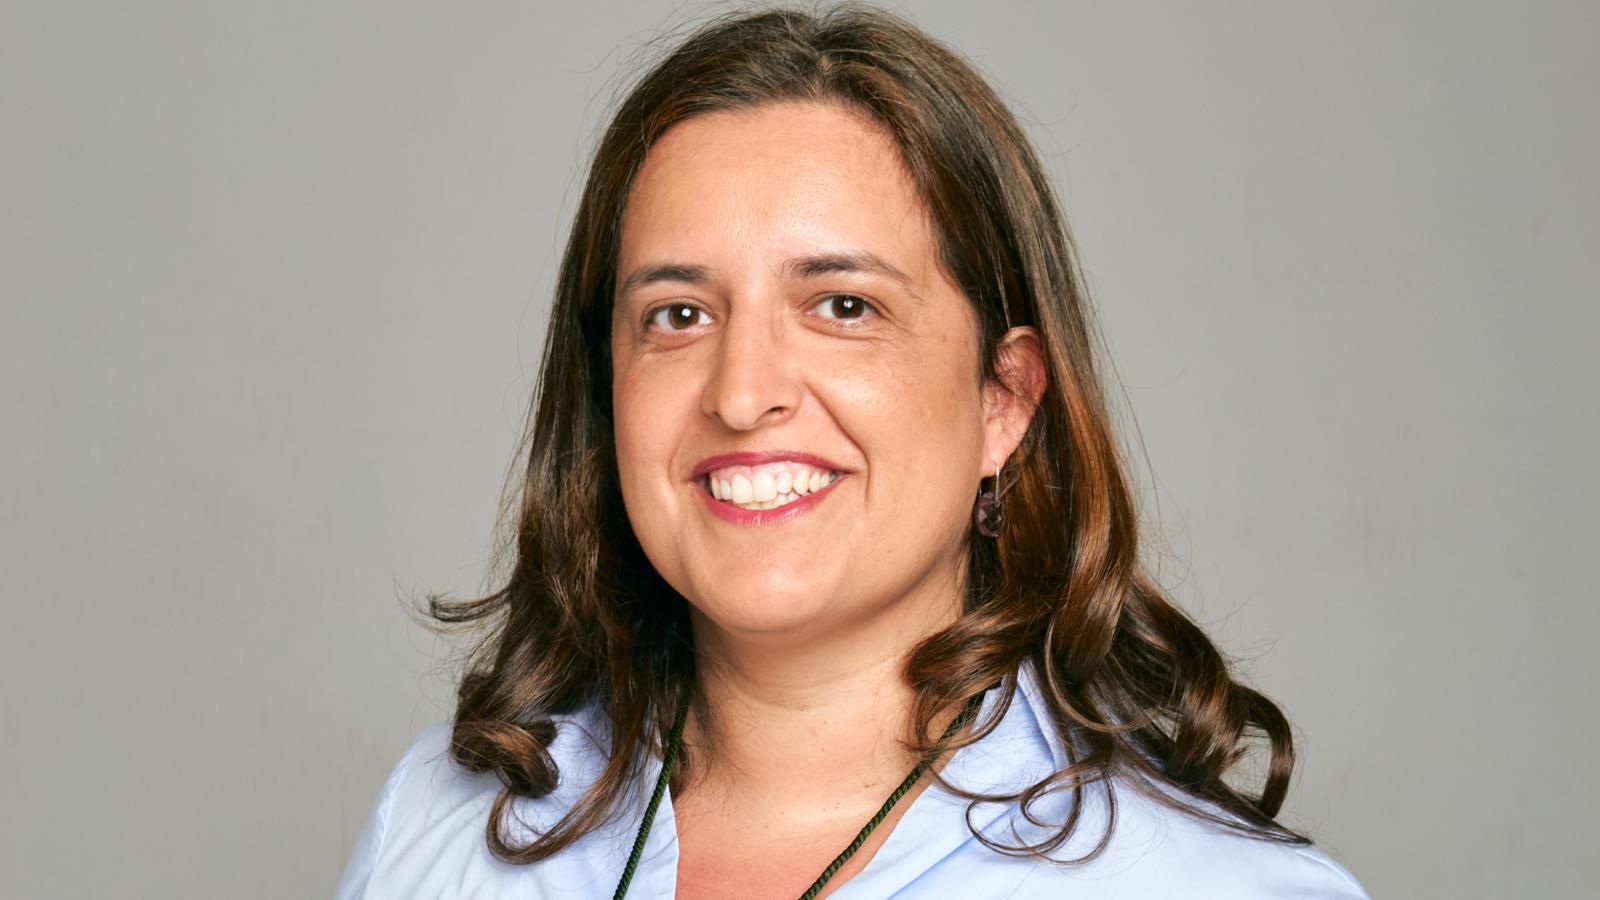 Maria Jesus Saenz - Capitalismo Consciente